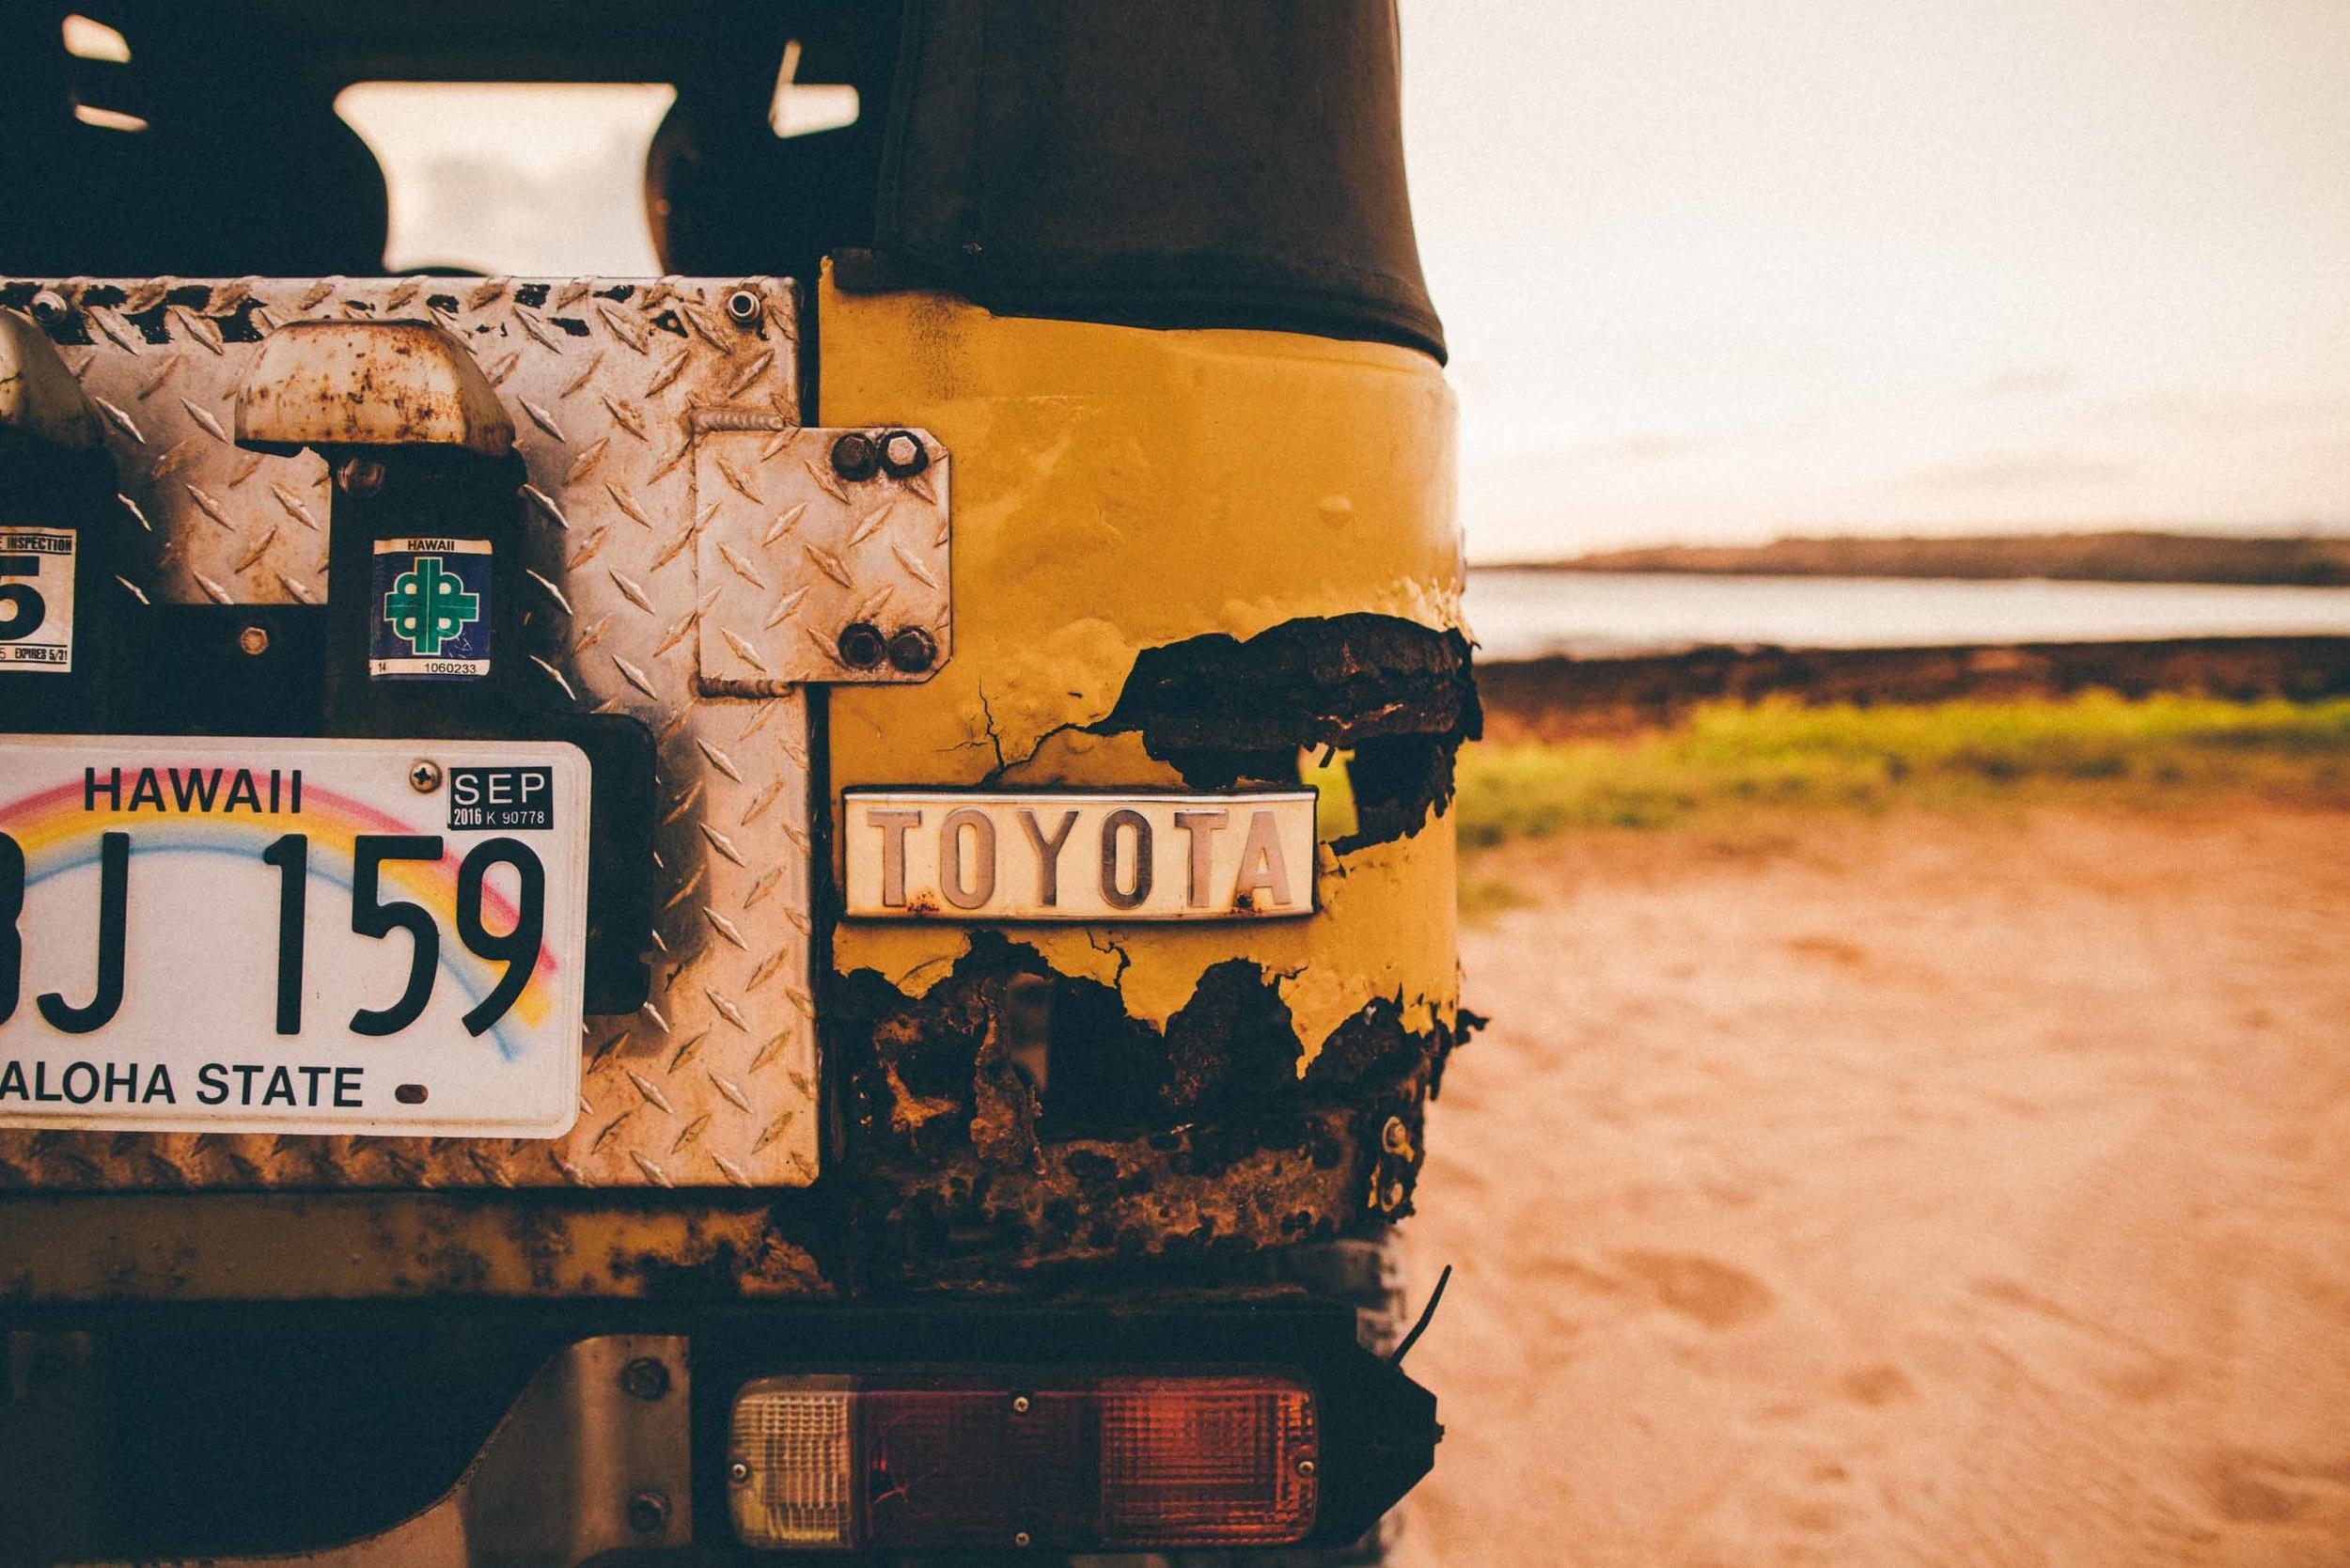 bryce-johnson-kauai-fj40-toyota-landcruiser-aloha exchange-slowtide-5.jpg